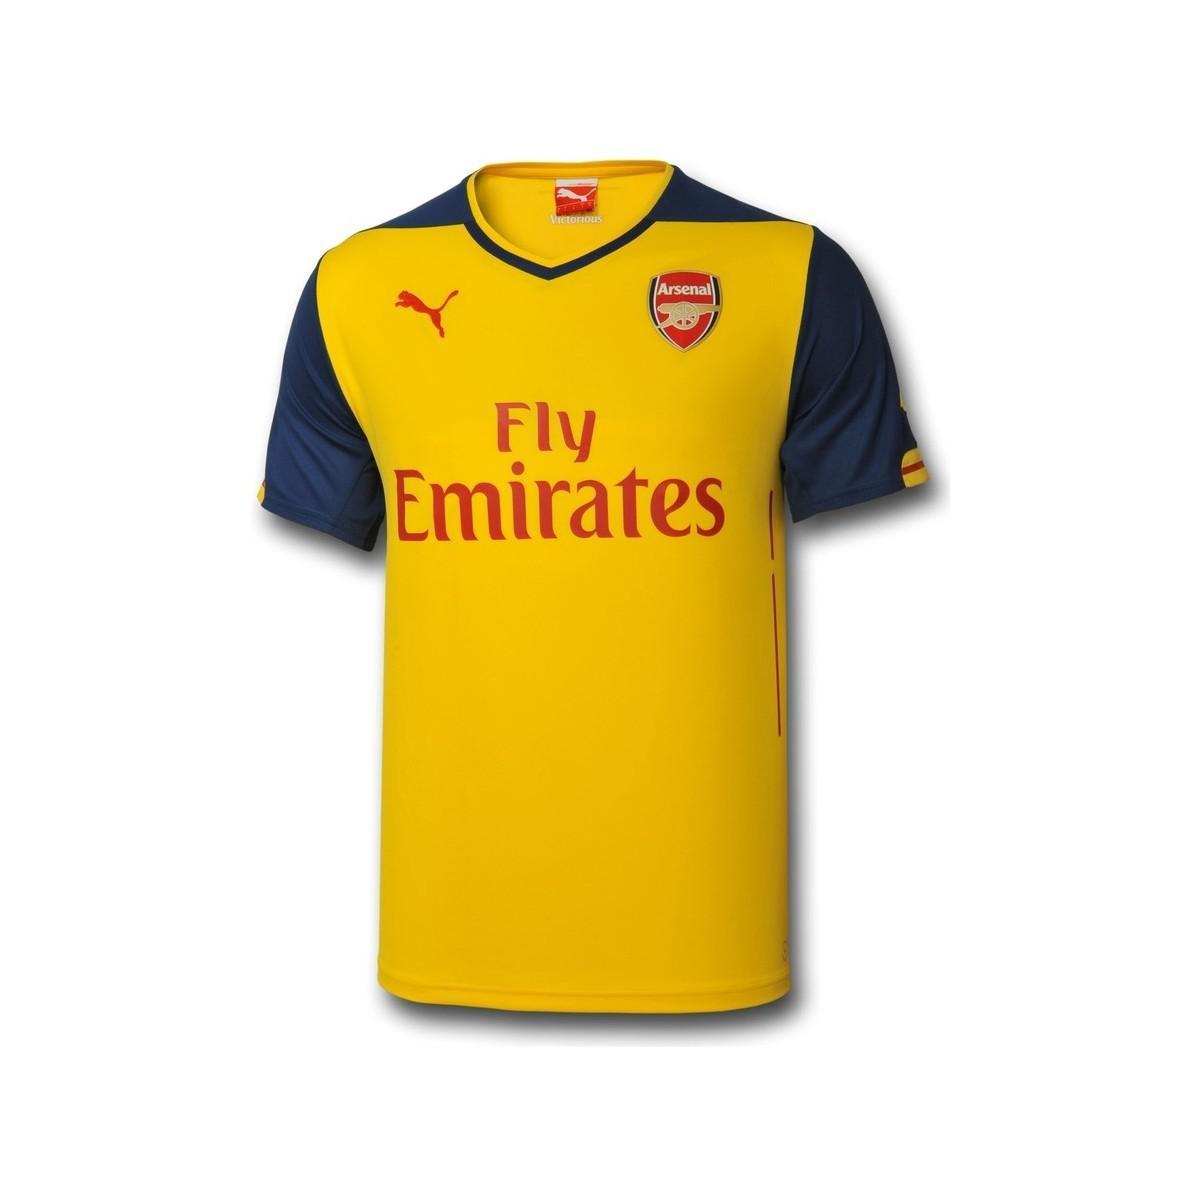 Puma 2014-15 Arsenal Away Shirt (alexis 17) Men s T Shirt In Yellow ... f73d1b39c